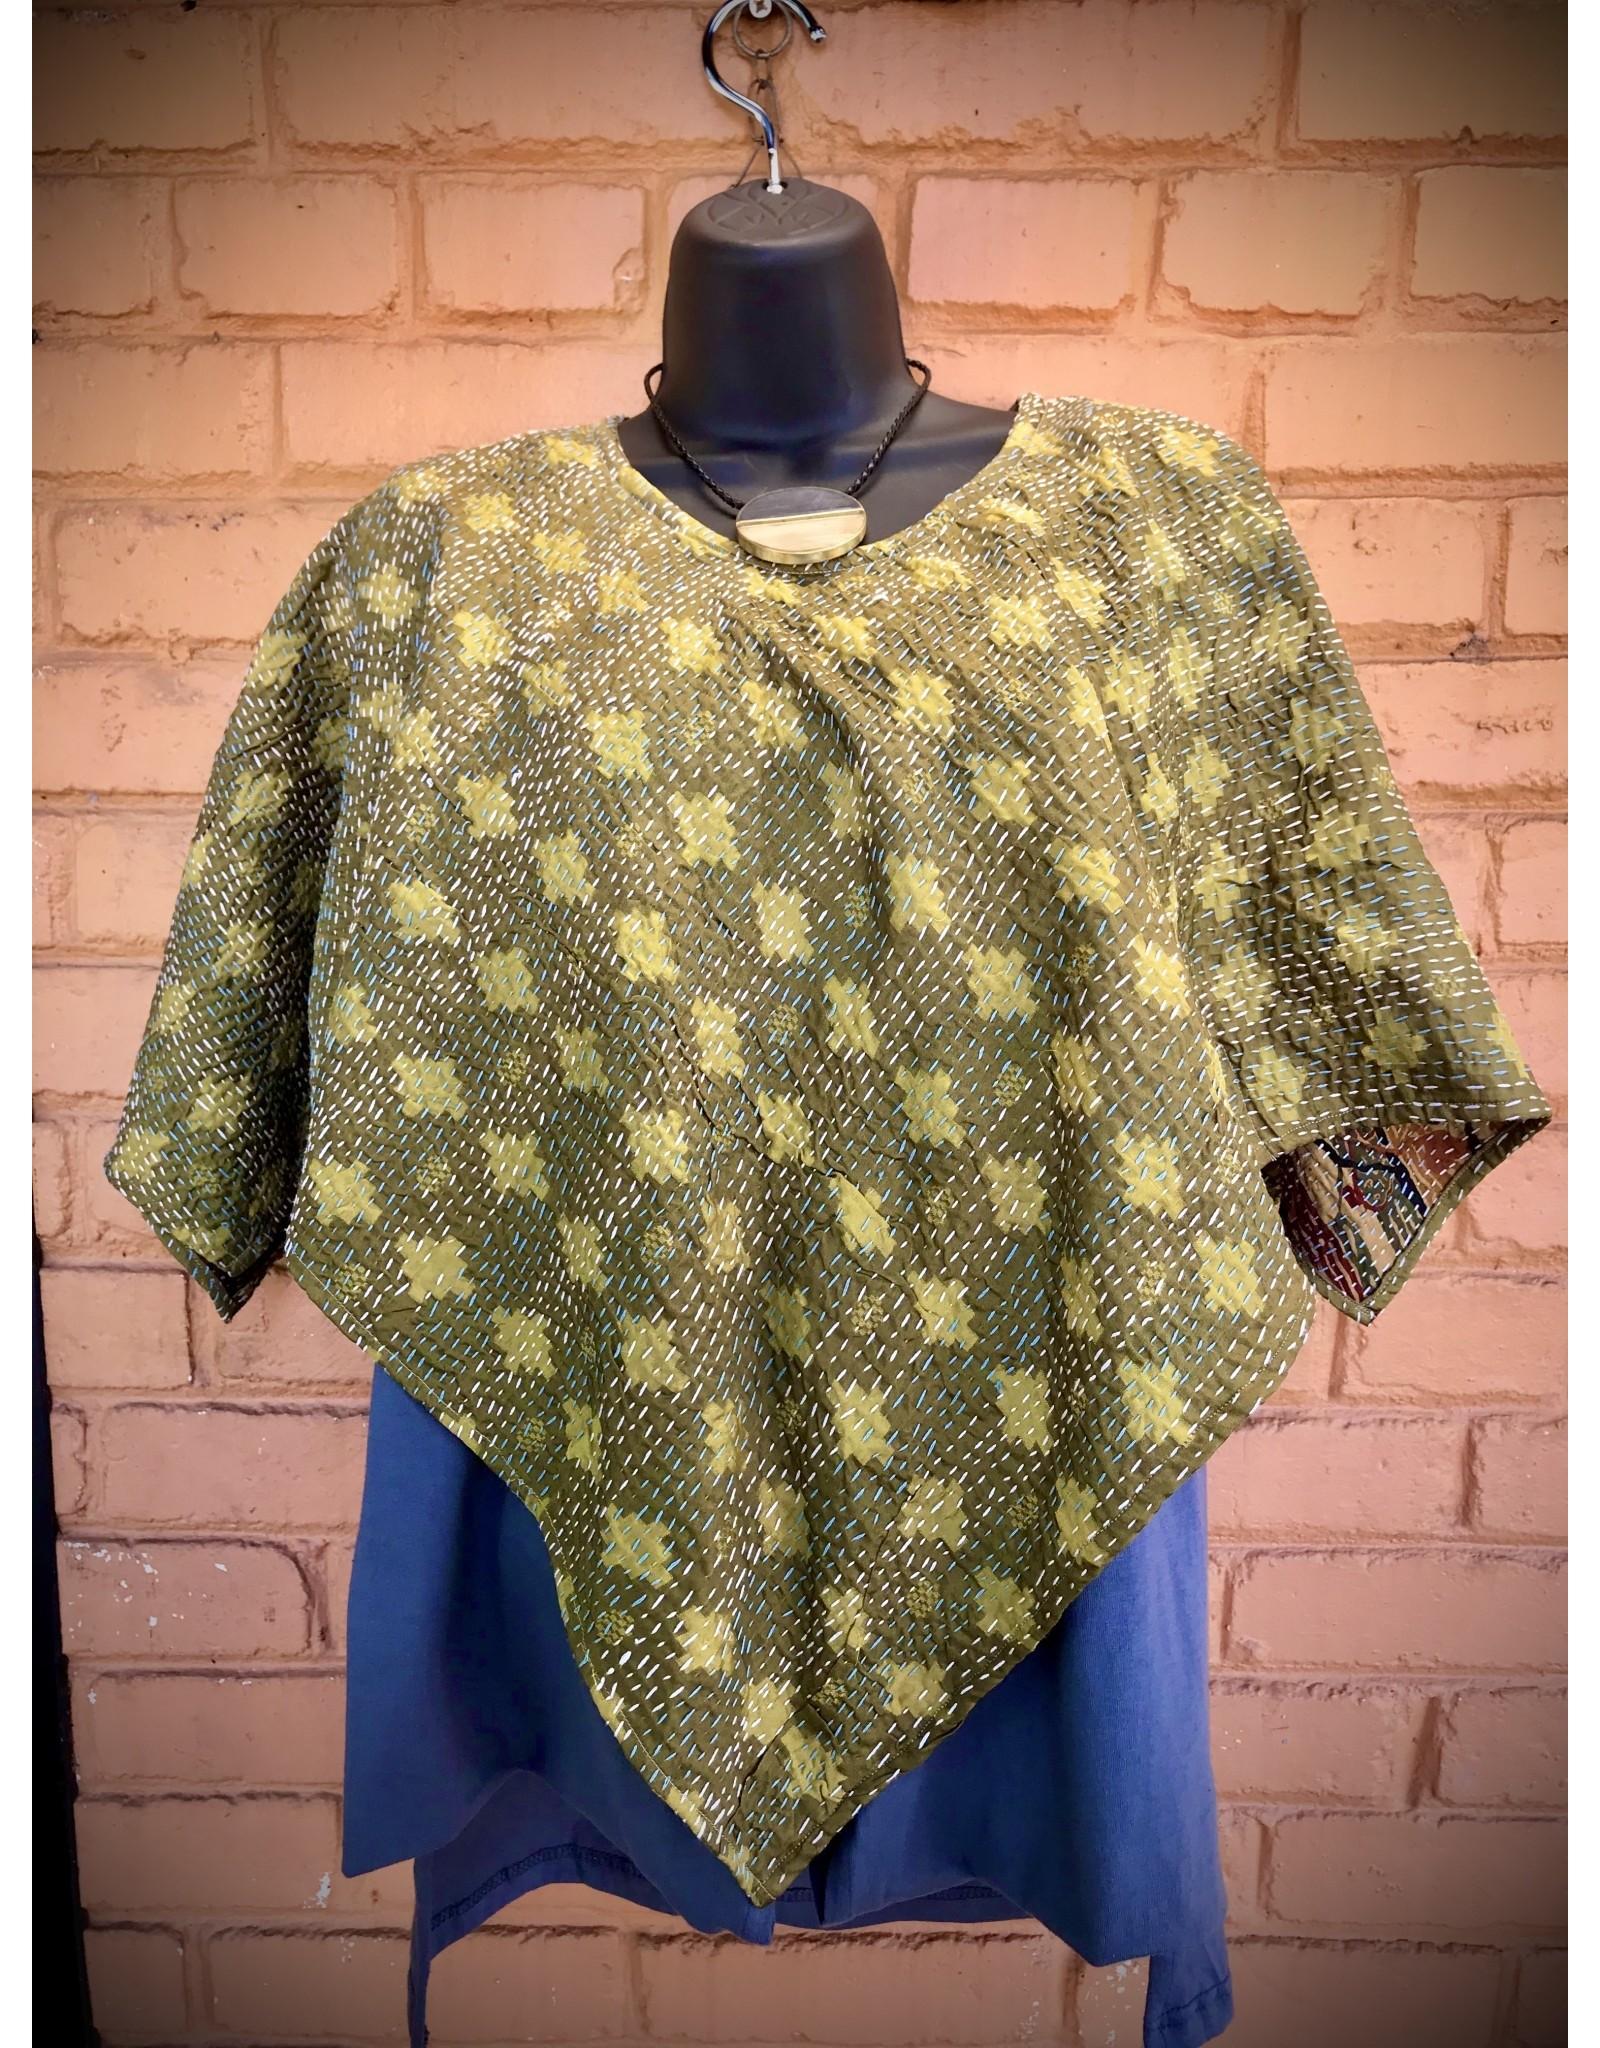 Kantha Triangle Stitched Sari Kimono Top, India